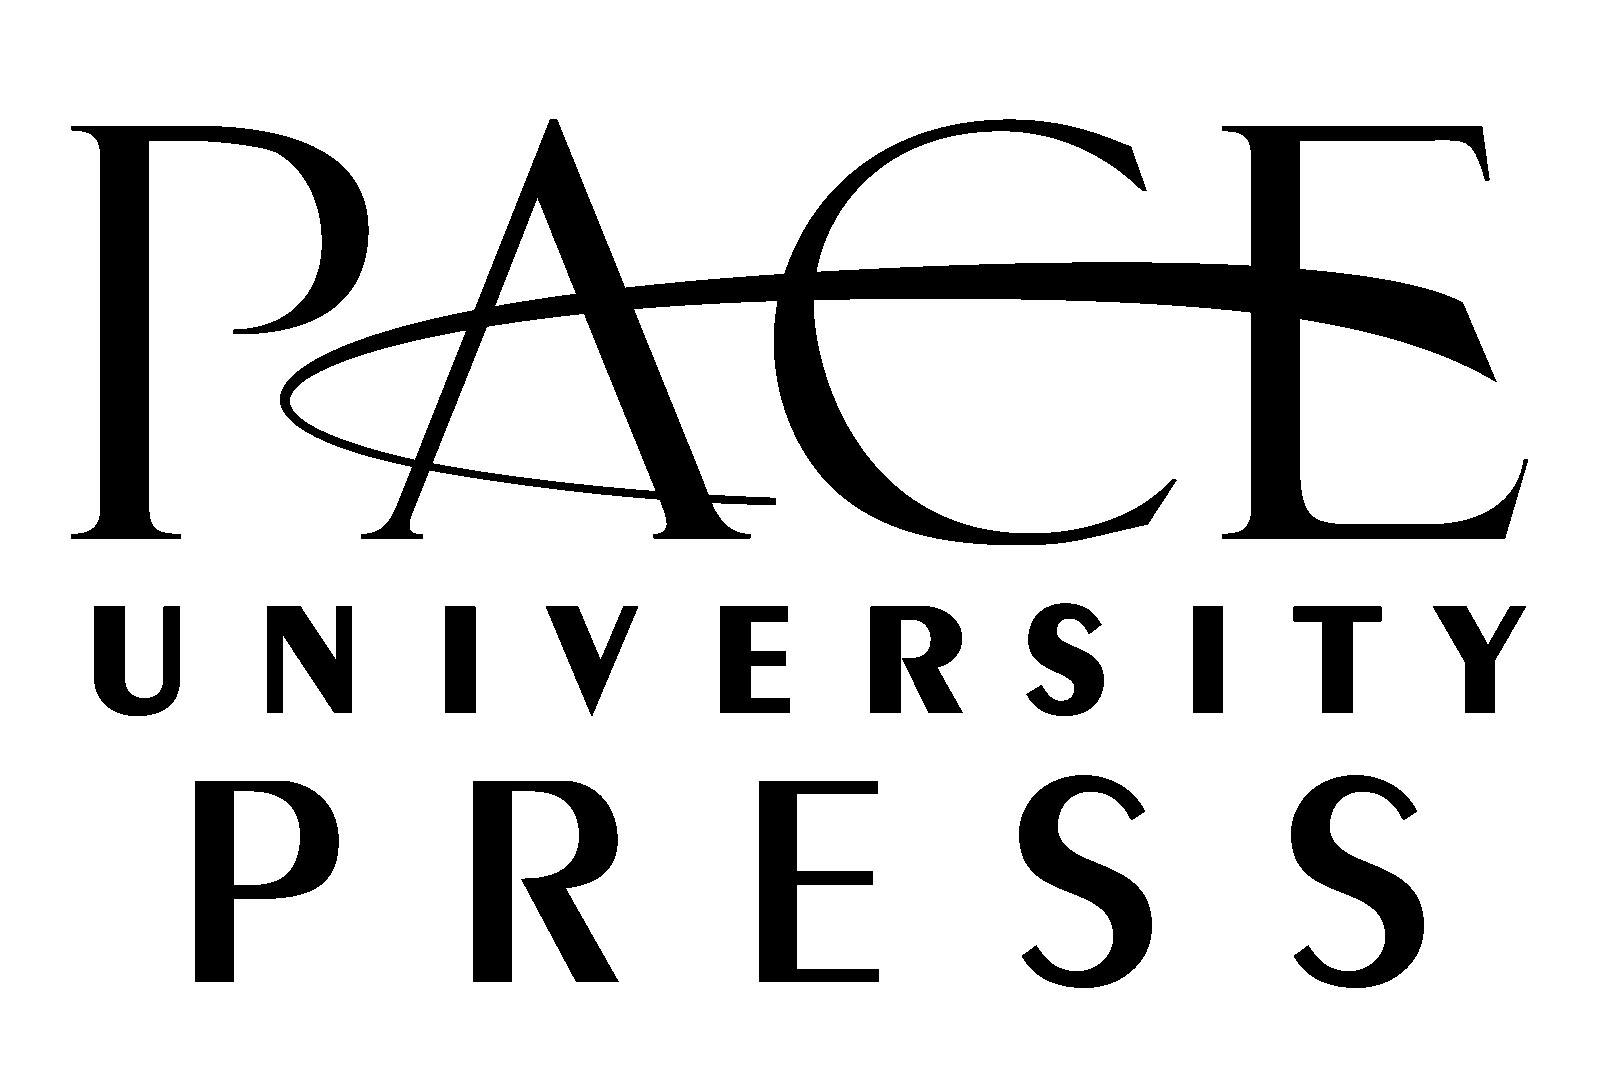 Pace Press